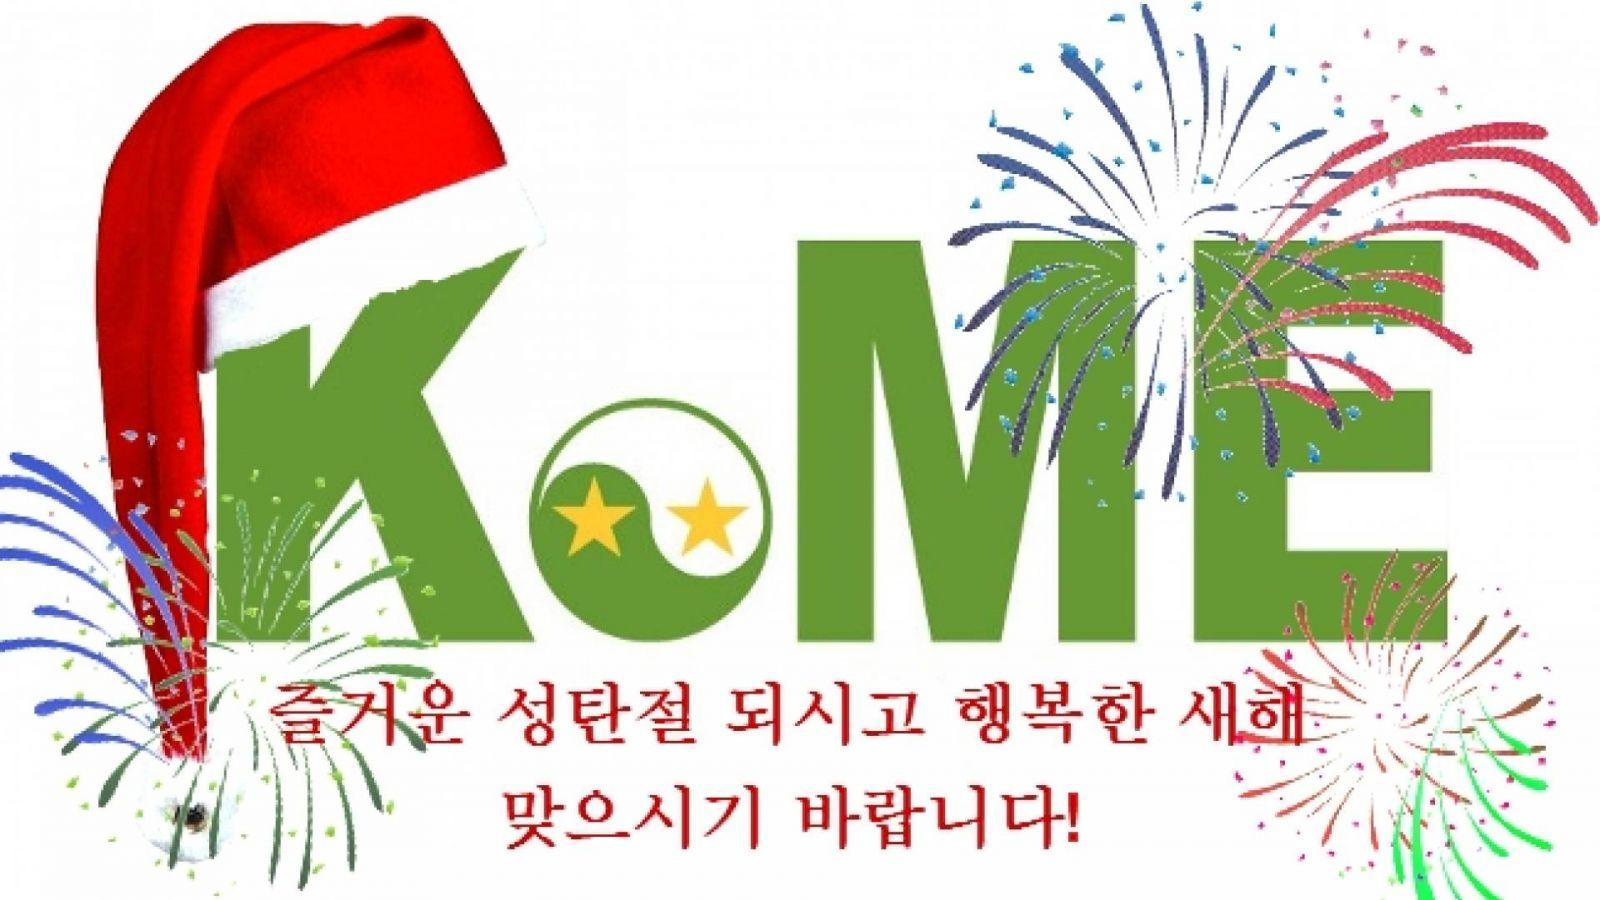 Joulukooste 2016 © KoME